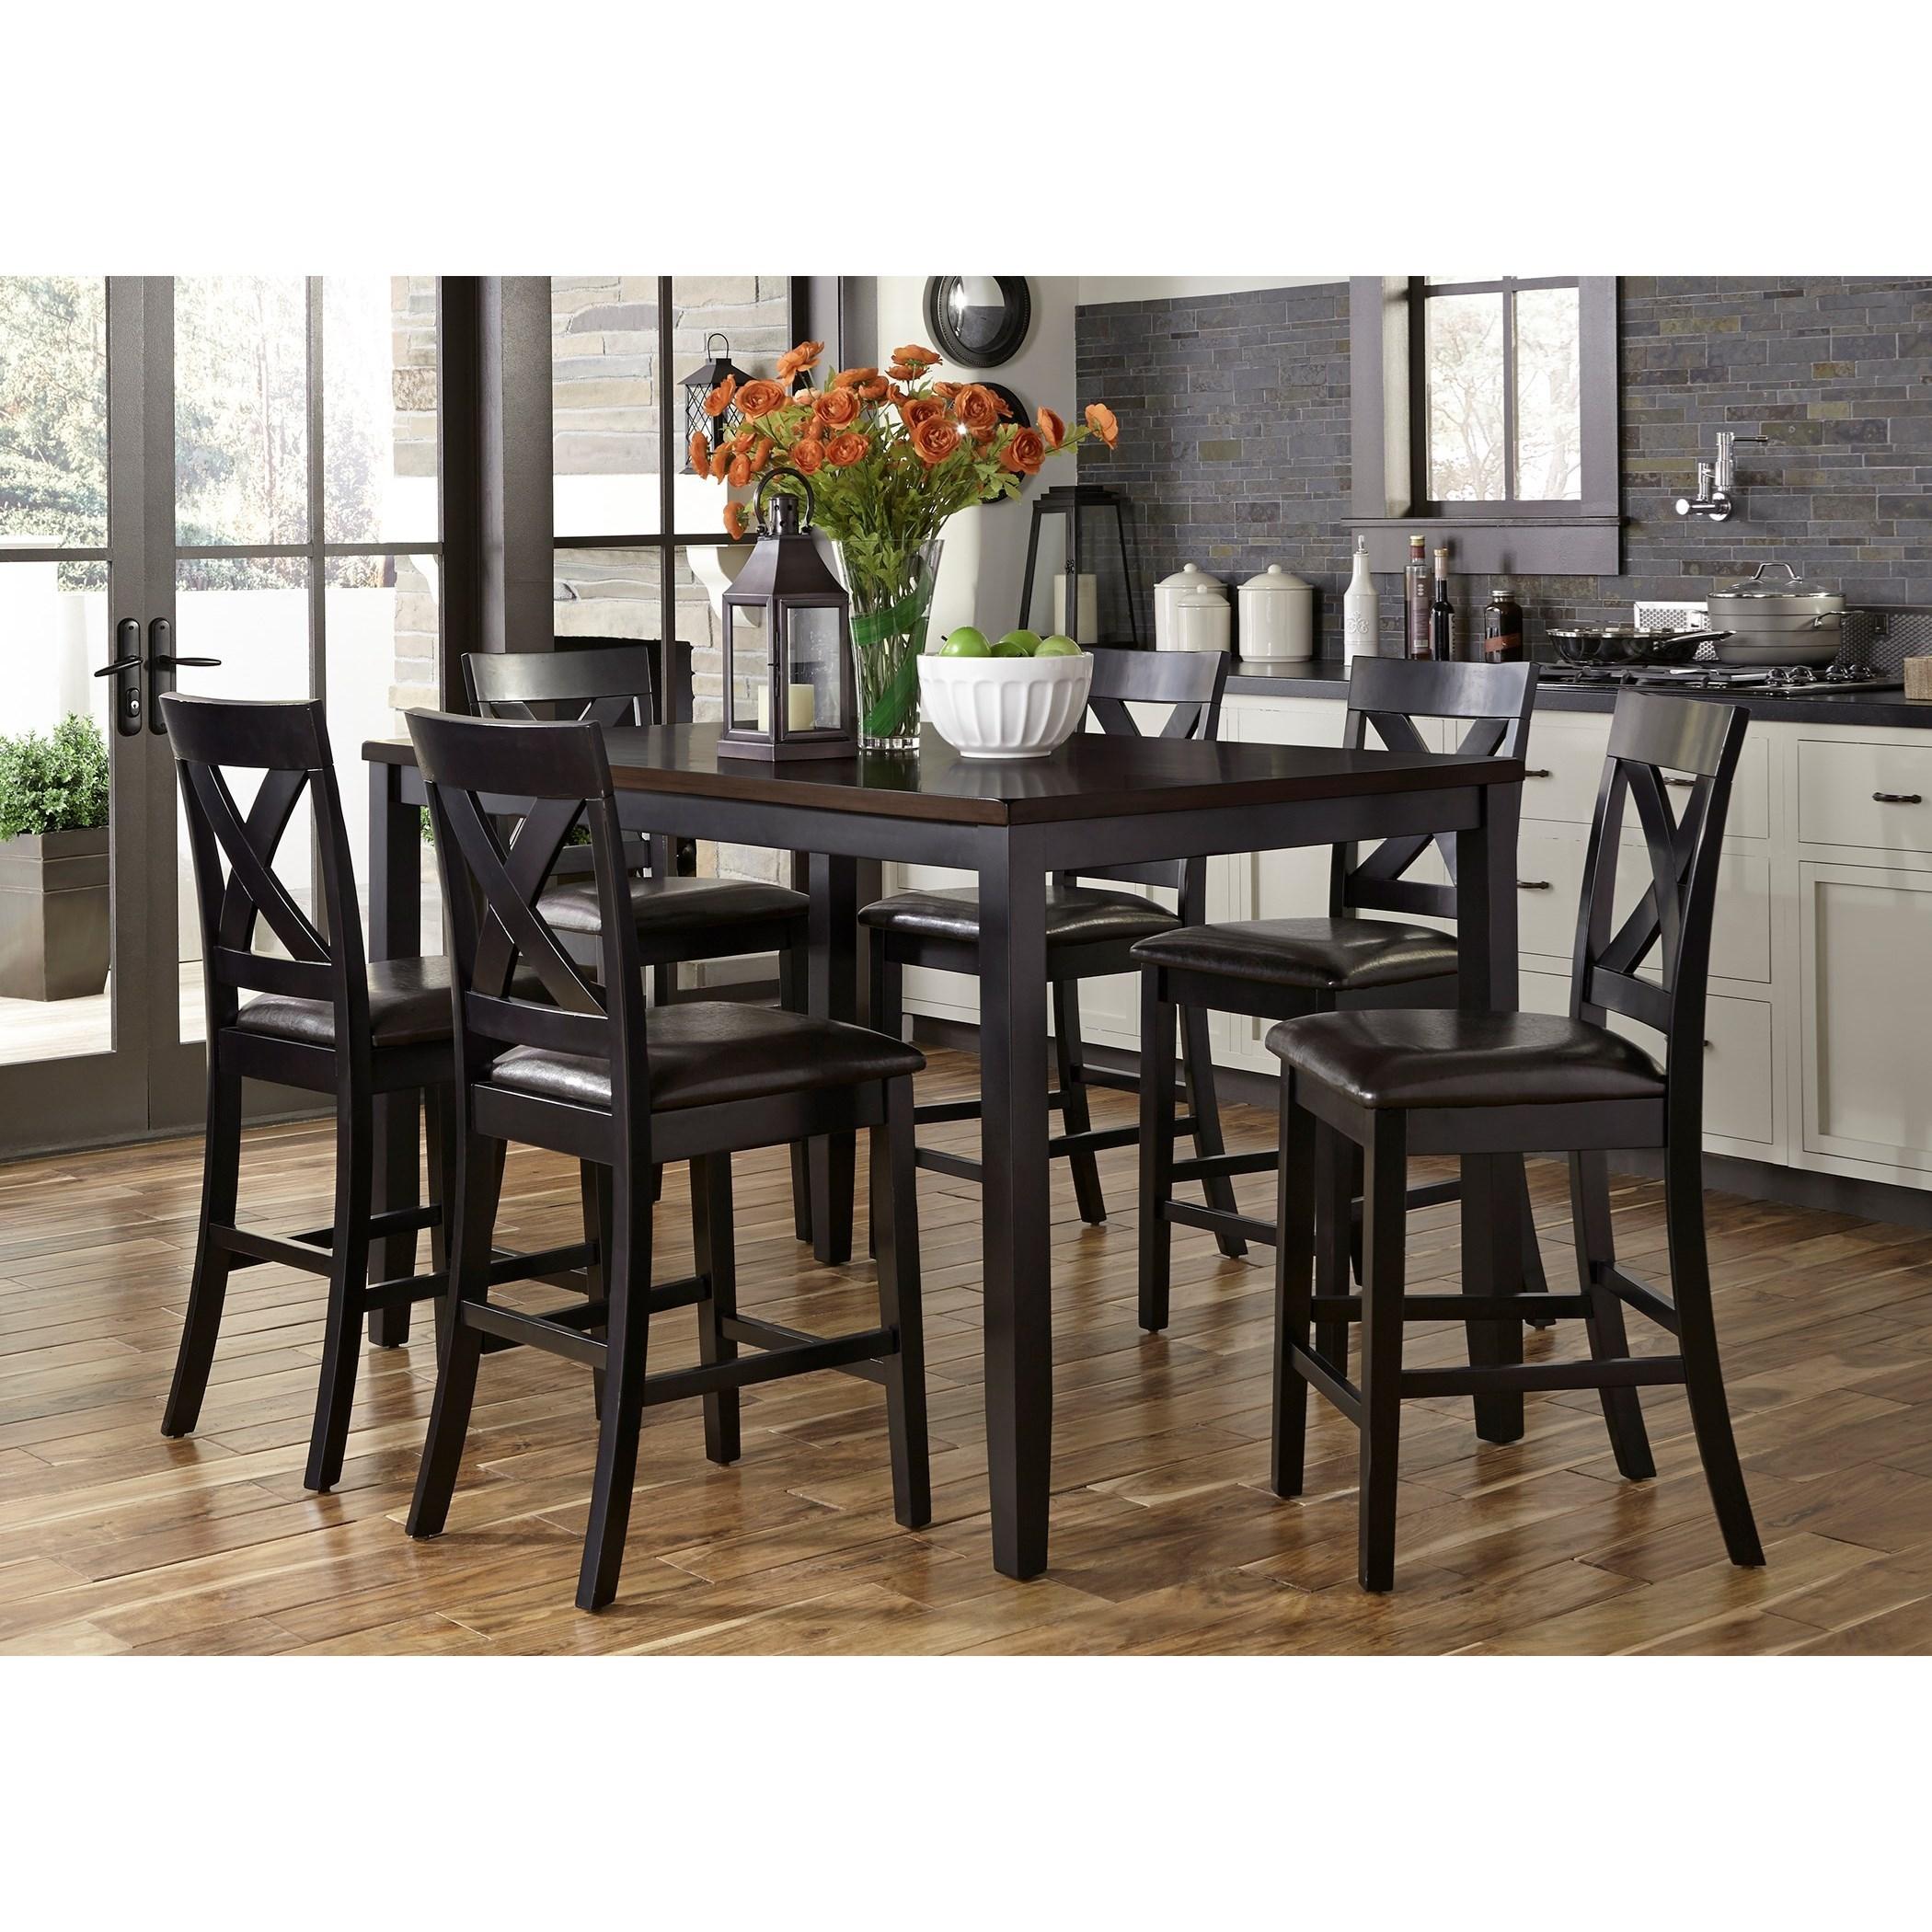 Liberty Furniture Thornton7 Piece Gathering Table Set